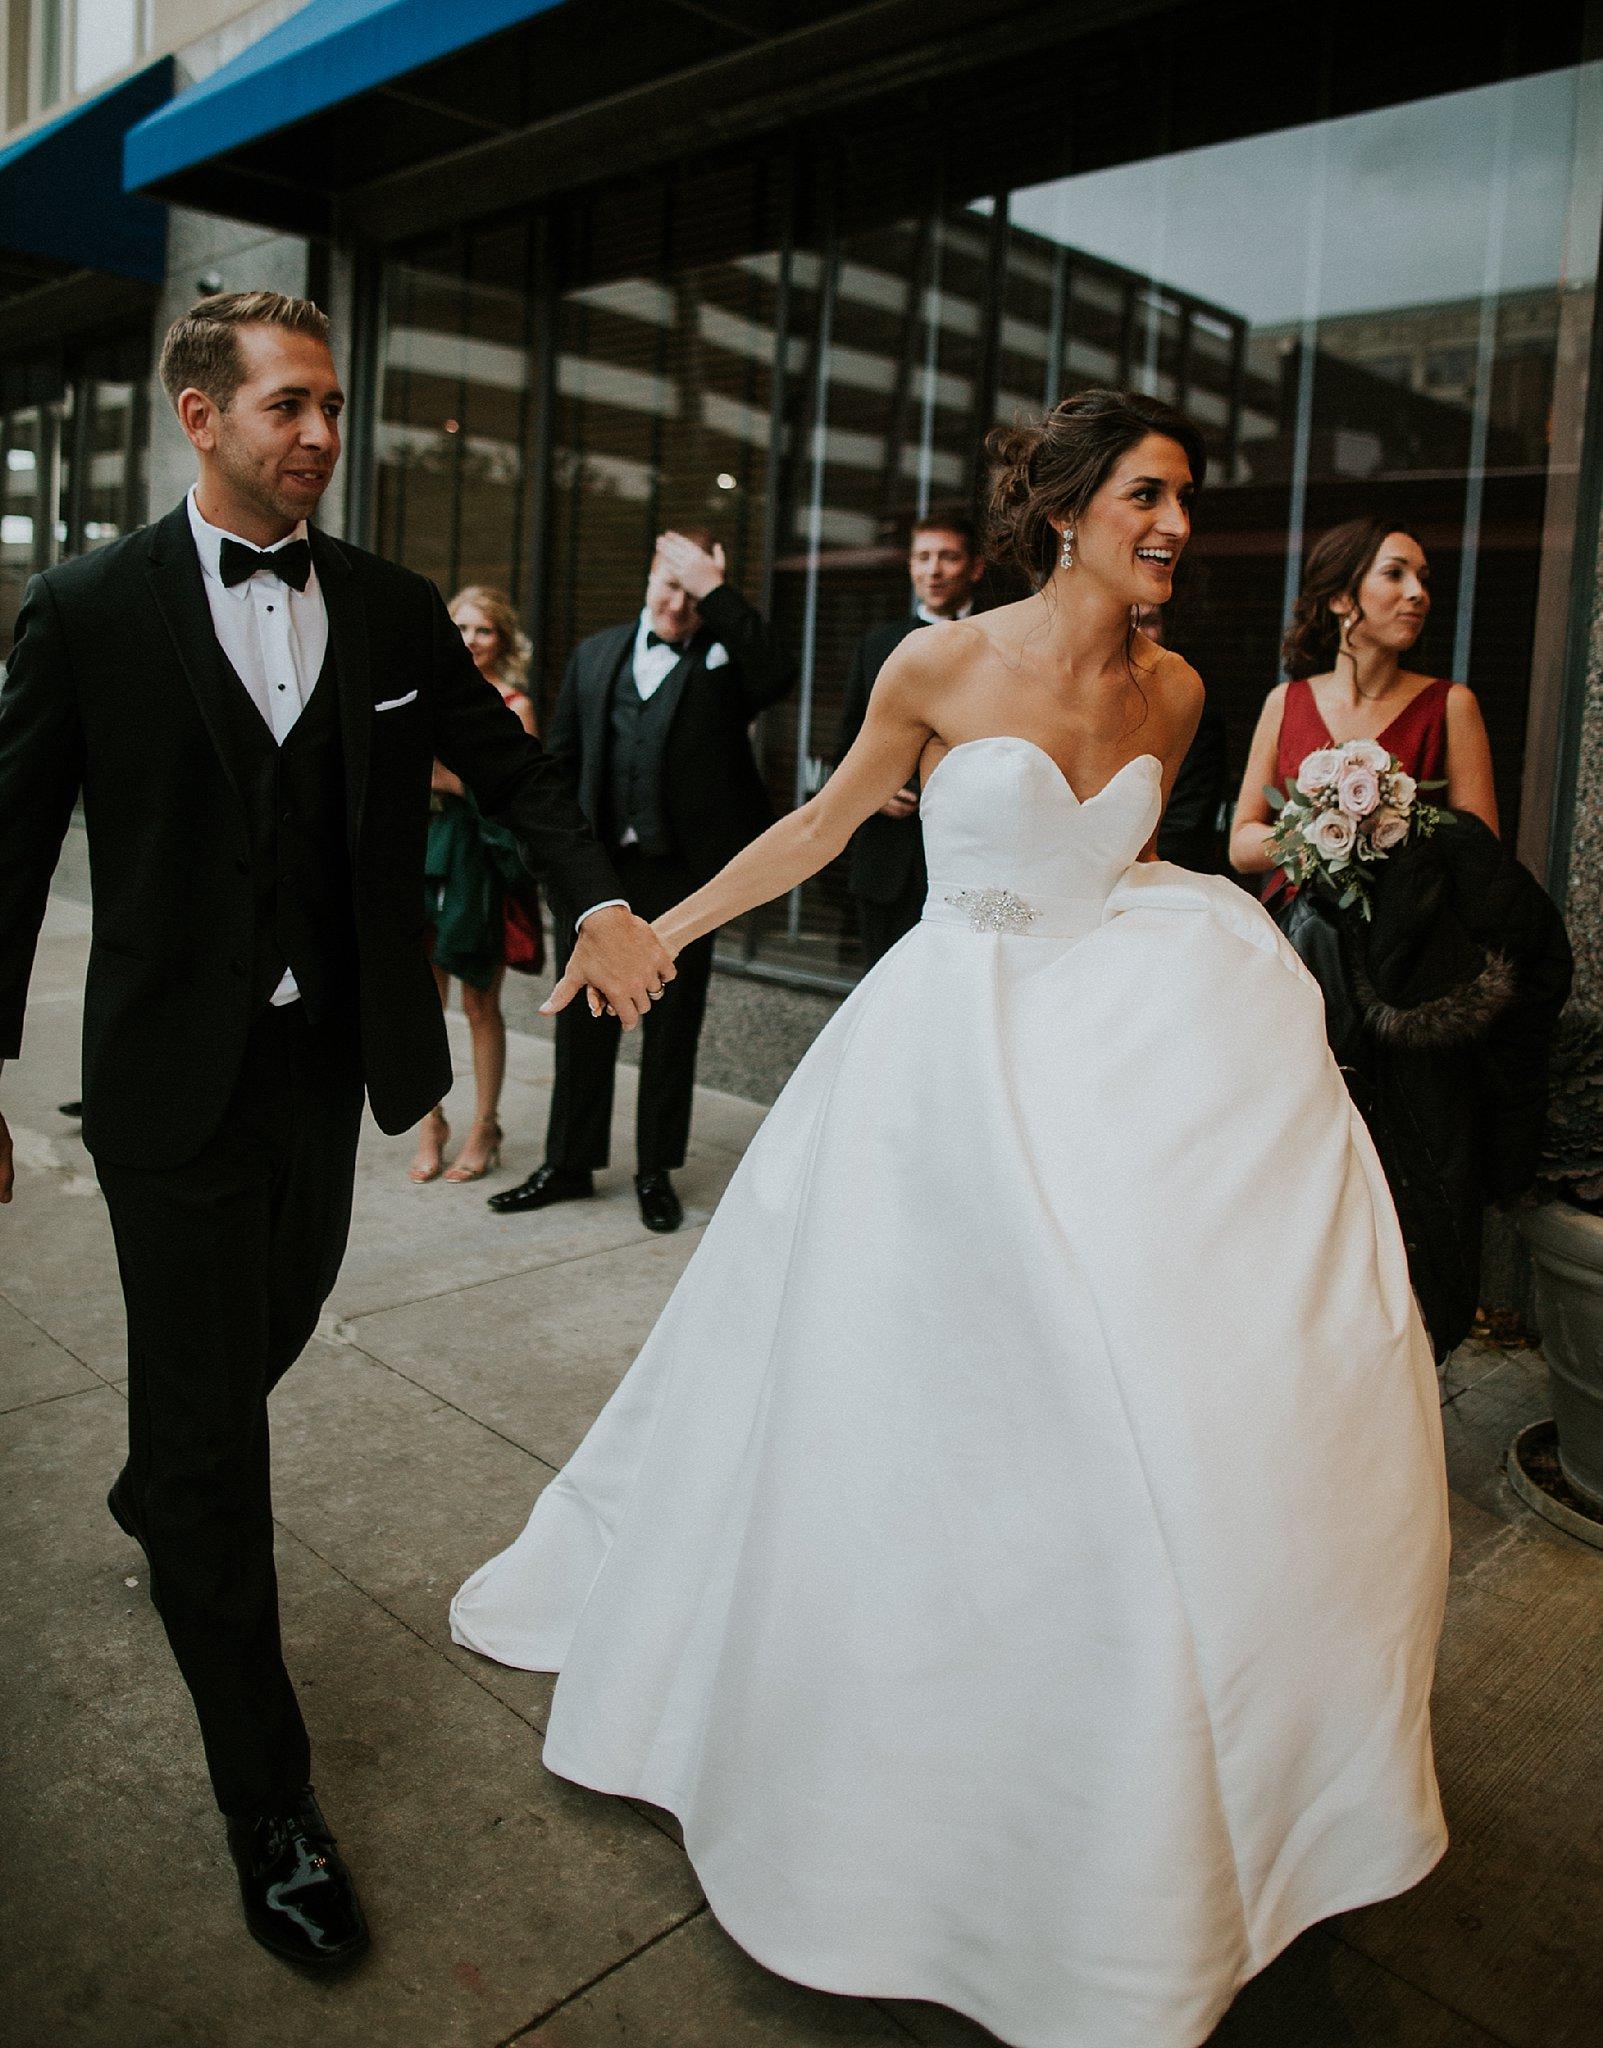 Matt-Lauren_St-Marys_Hilton-City-Center-Milwaukee-Wedding_liller-photo_0059.jpg